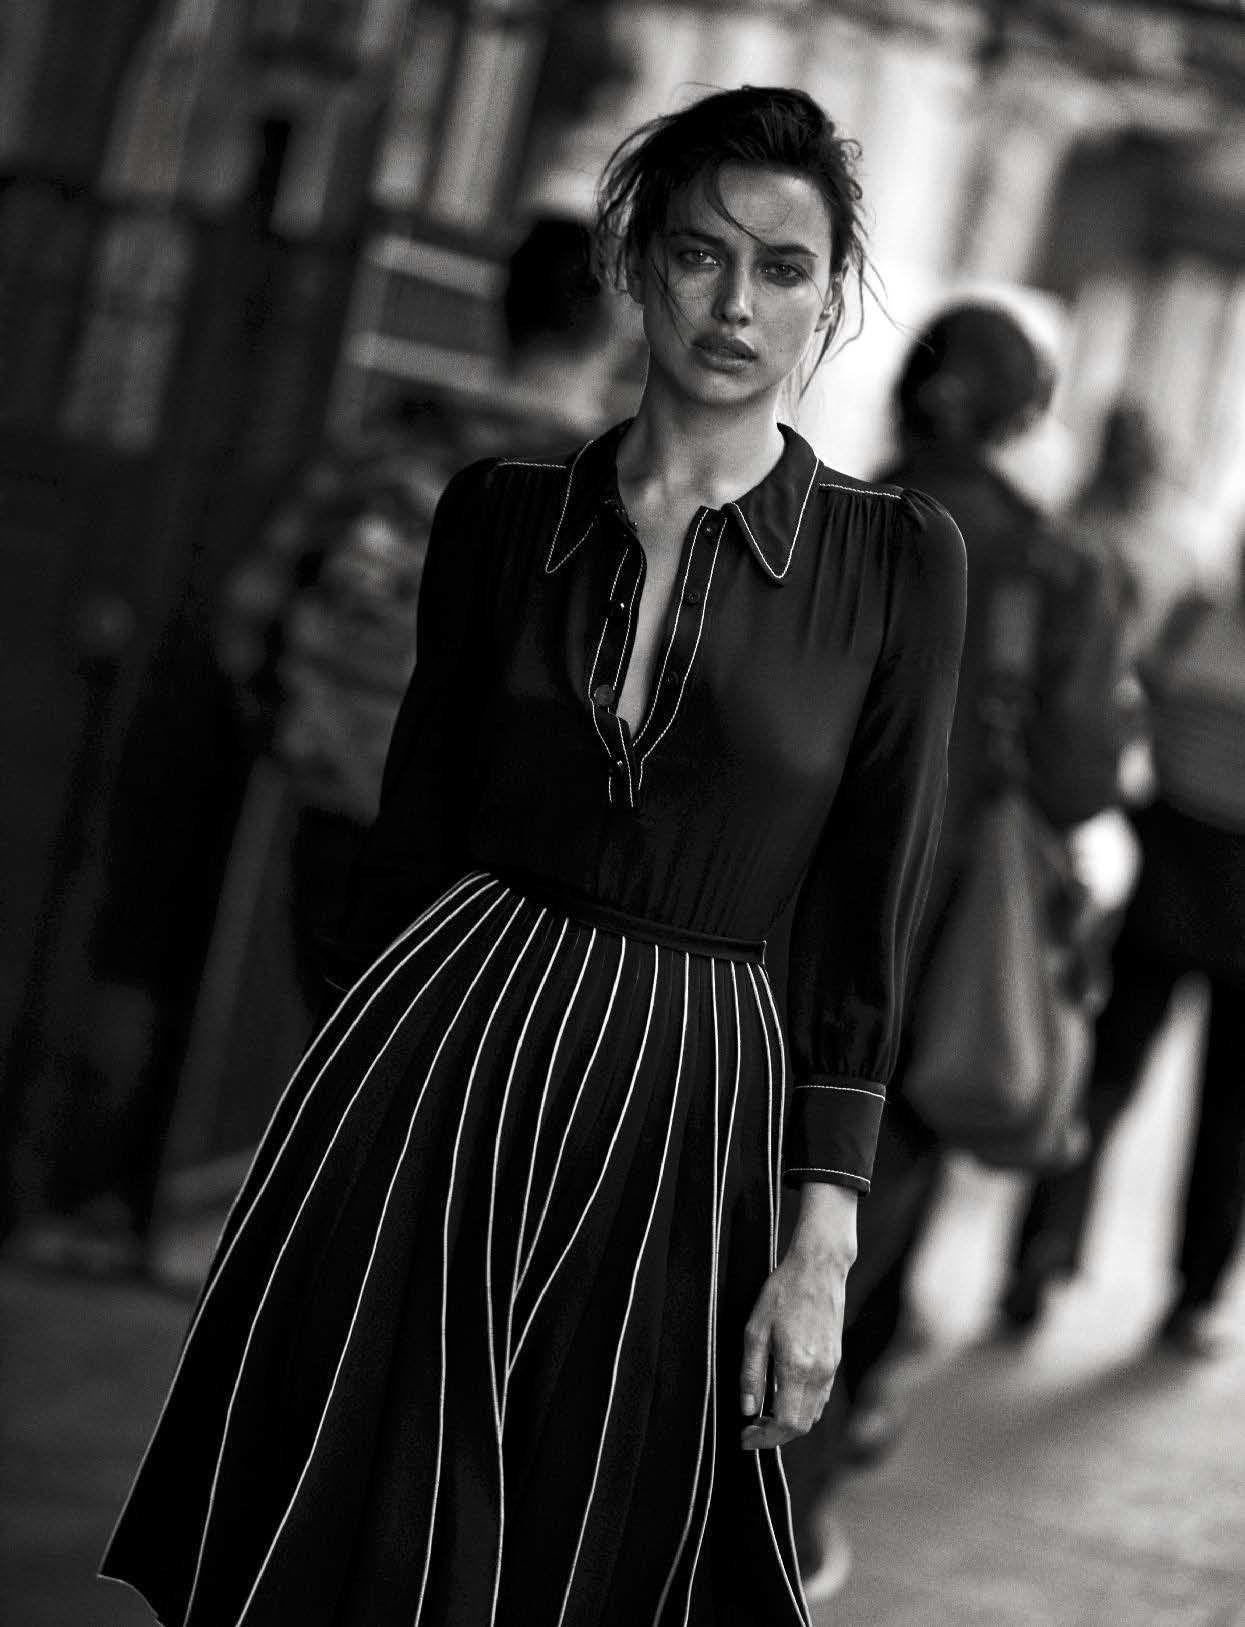 Irina shayk peter lindbergh white fashion womens fashion fashion models fashion editor